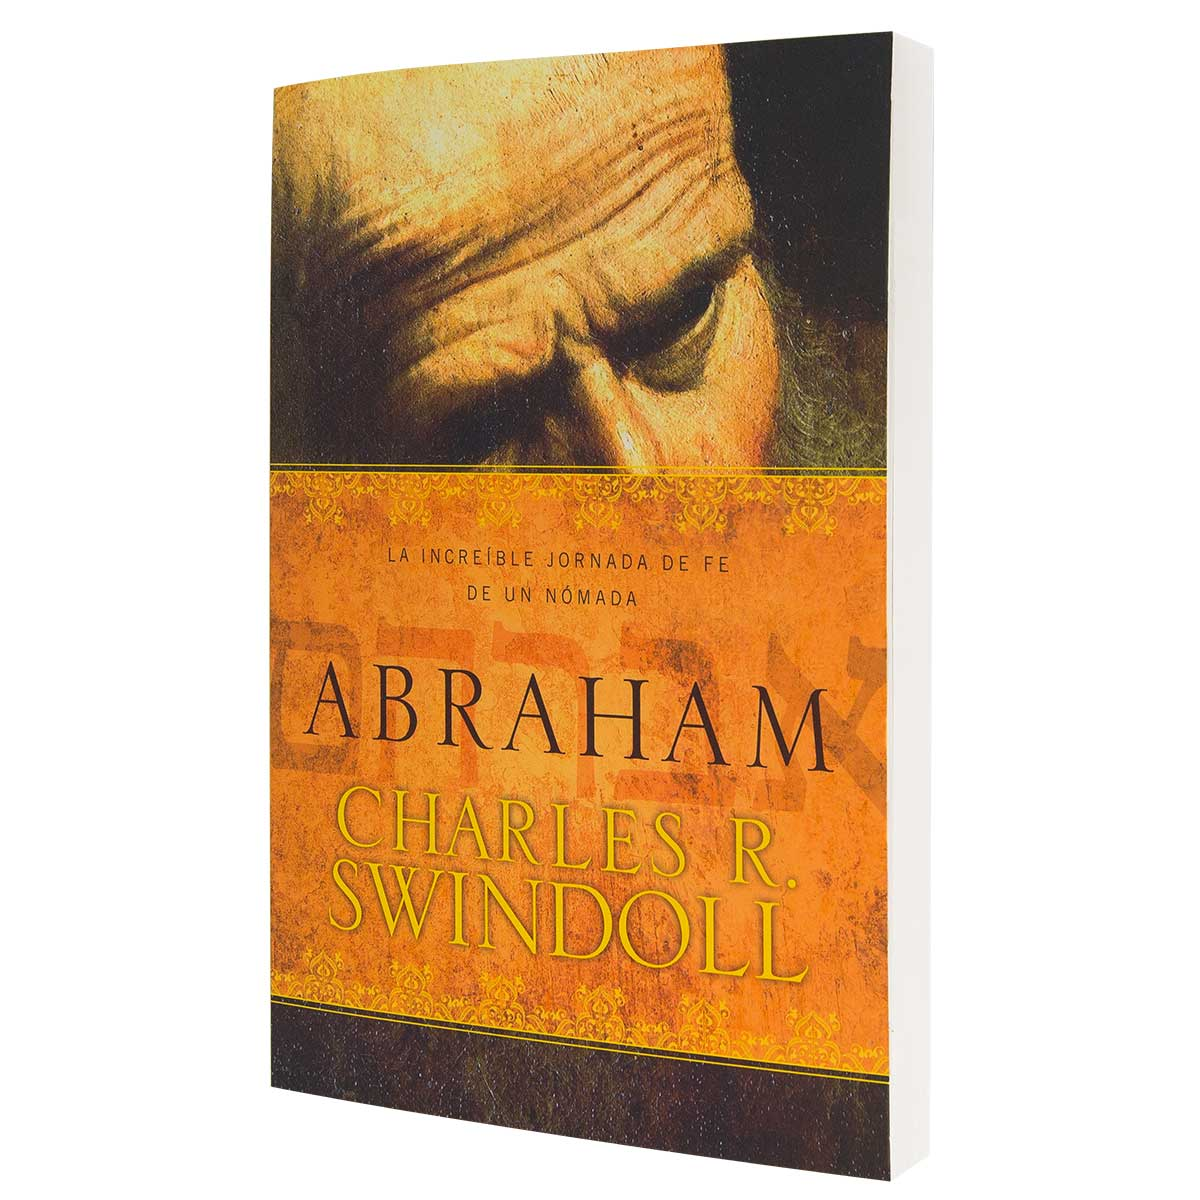 Abraham - Dr. Swindoll